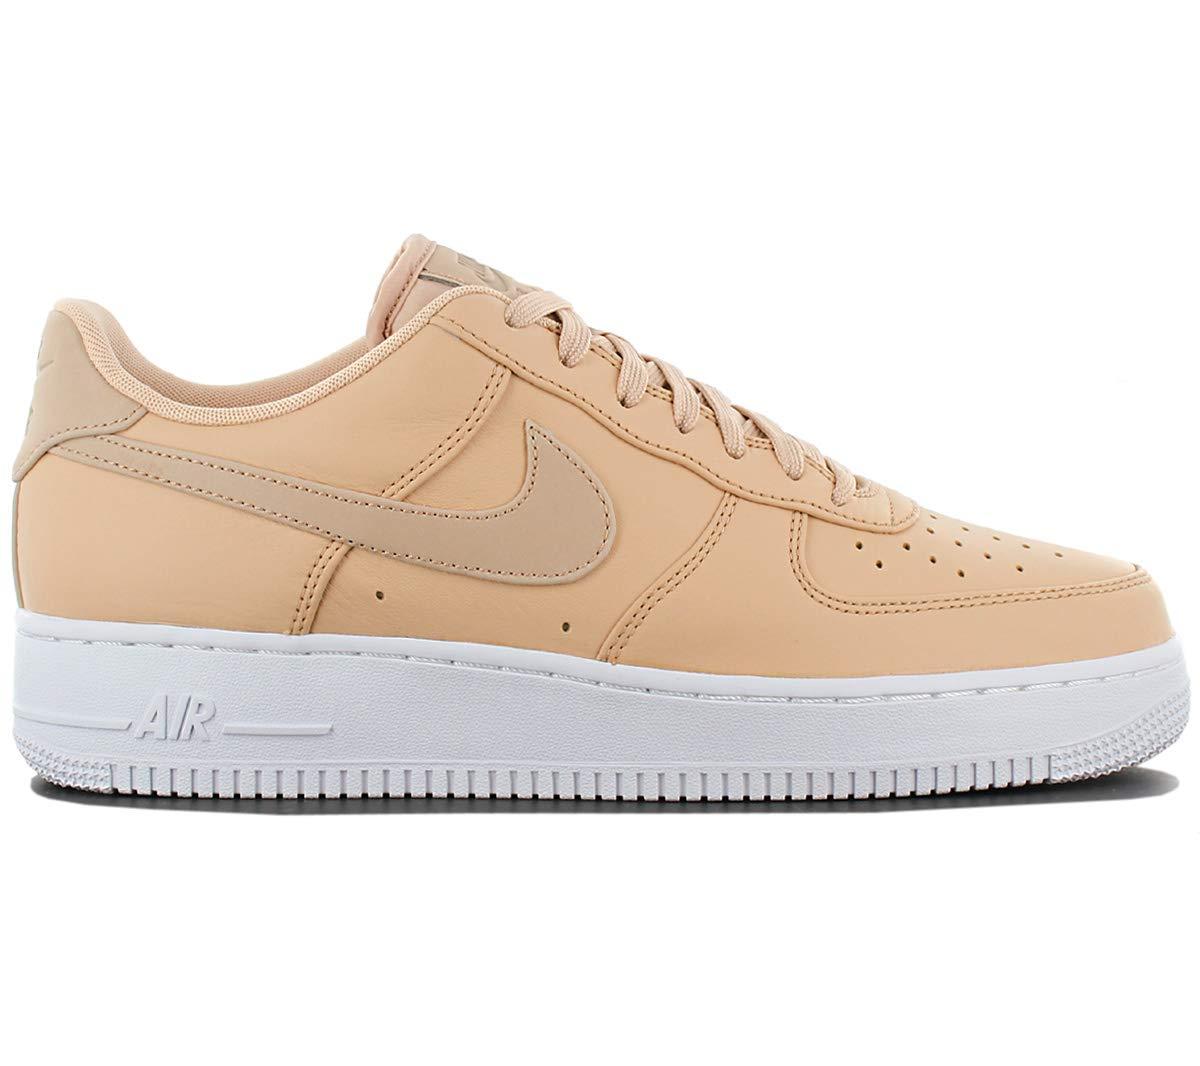 sale retailer b8255 5eeb4 Galleon - Nike Mens Air Force 1 07 QS Basketball Shoes (10.5)